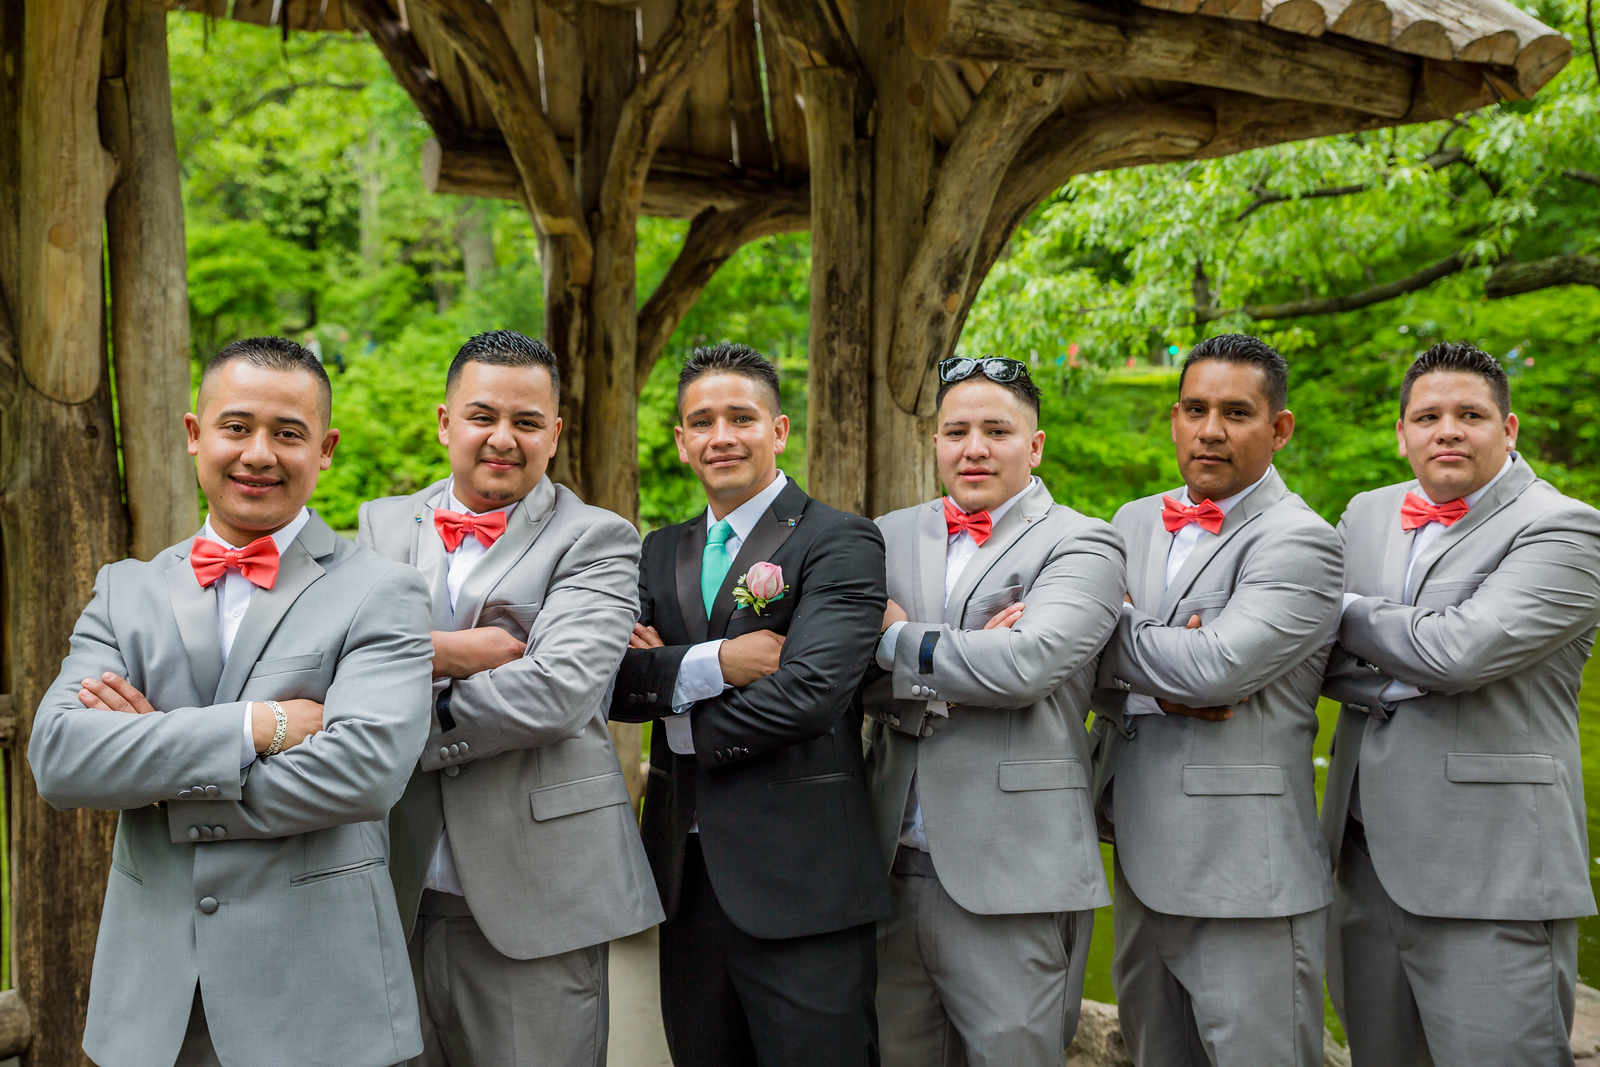 Central Park Wedding - Stefany & Diego-116